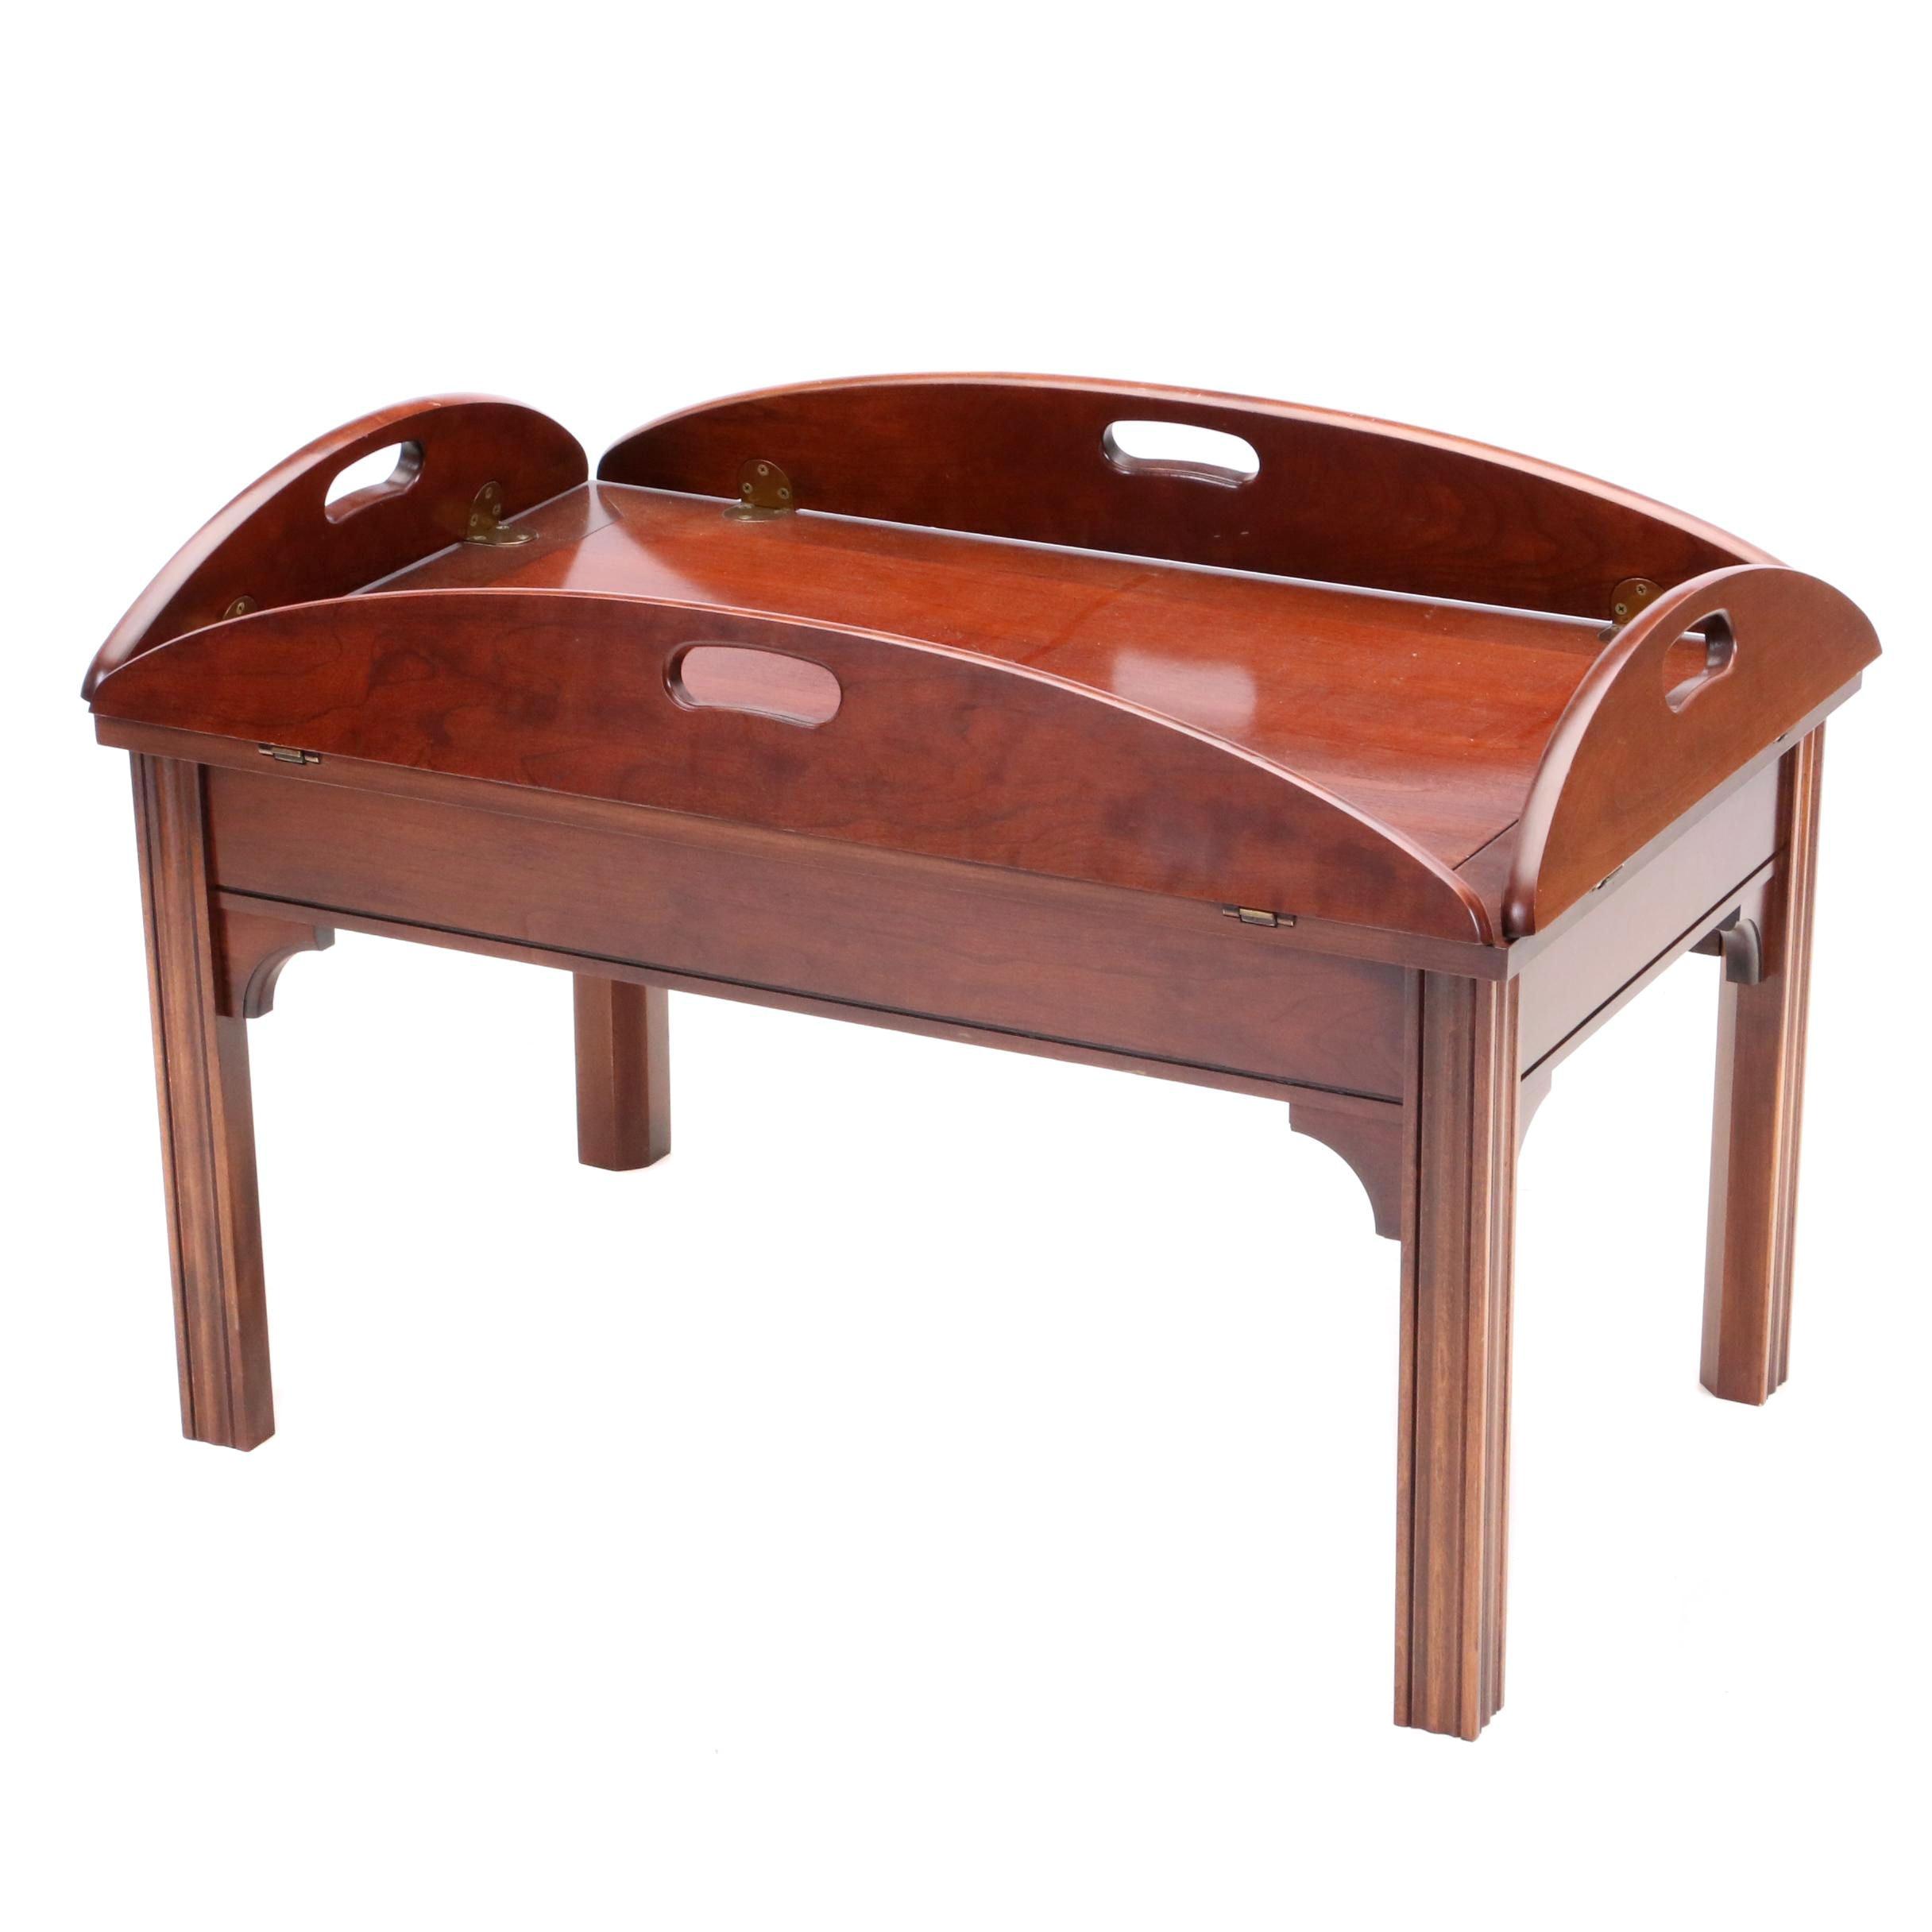 Vintage Butlers Coffee Table